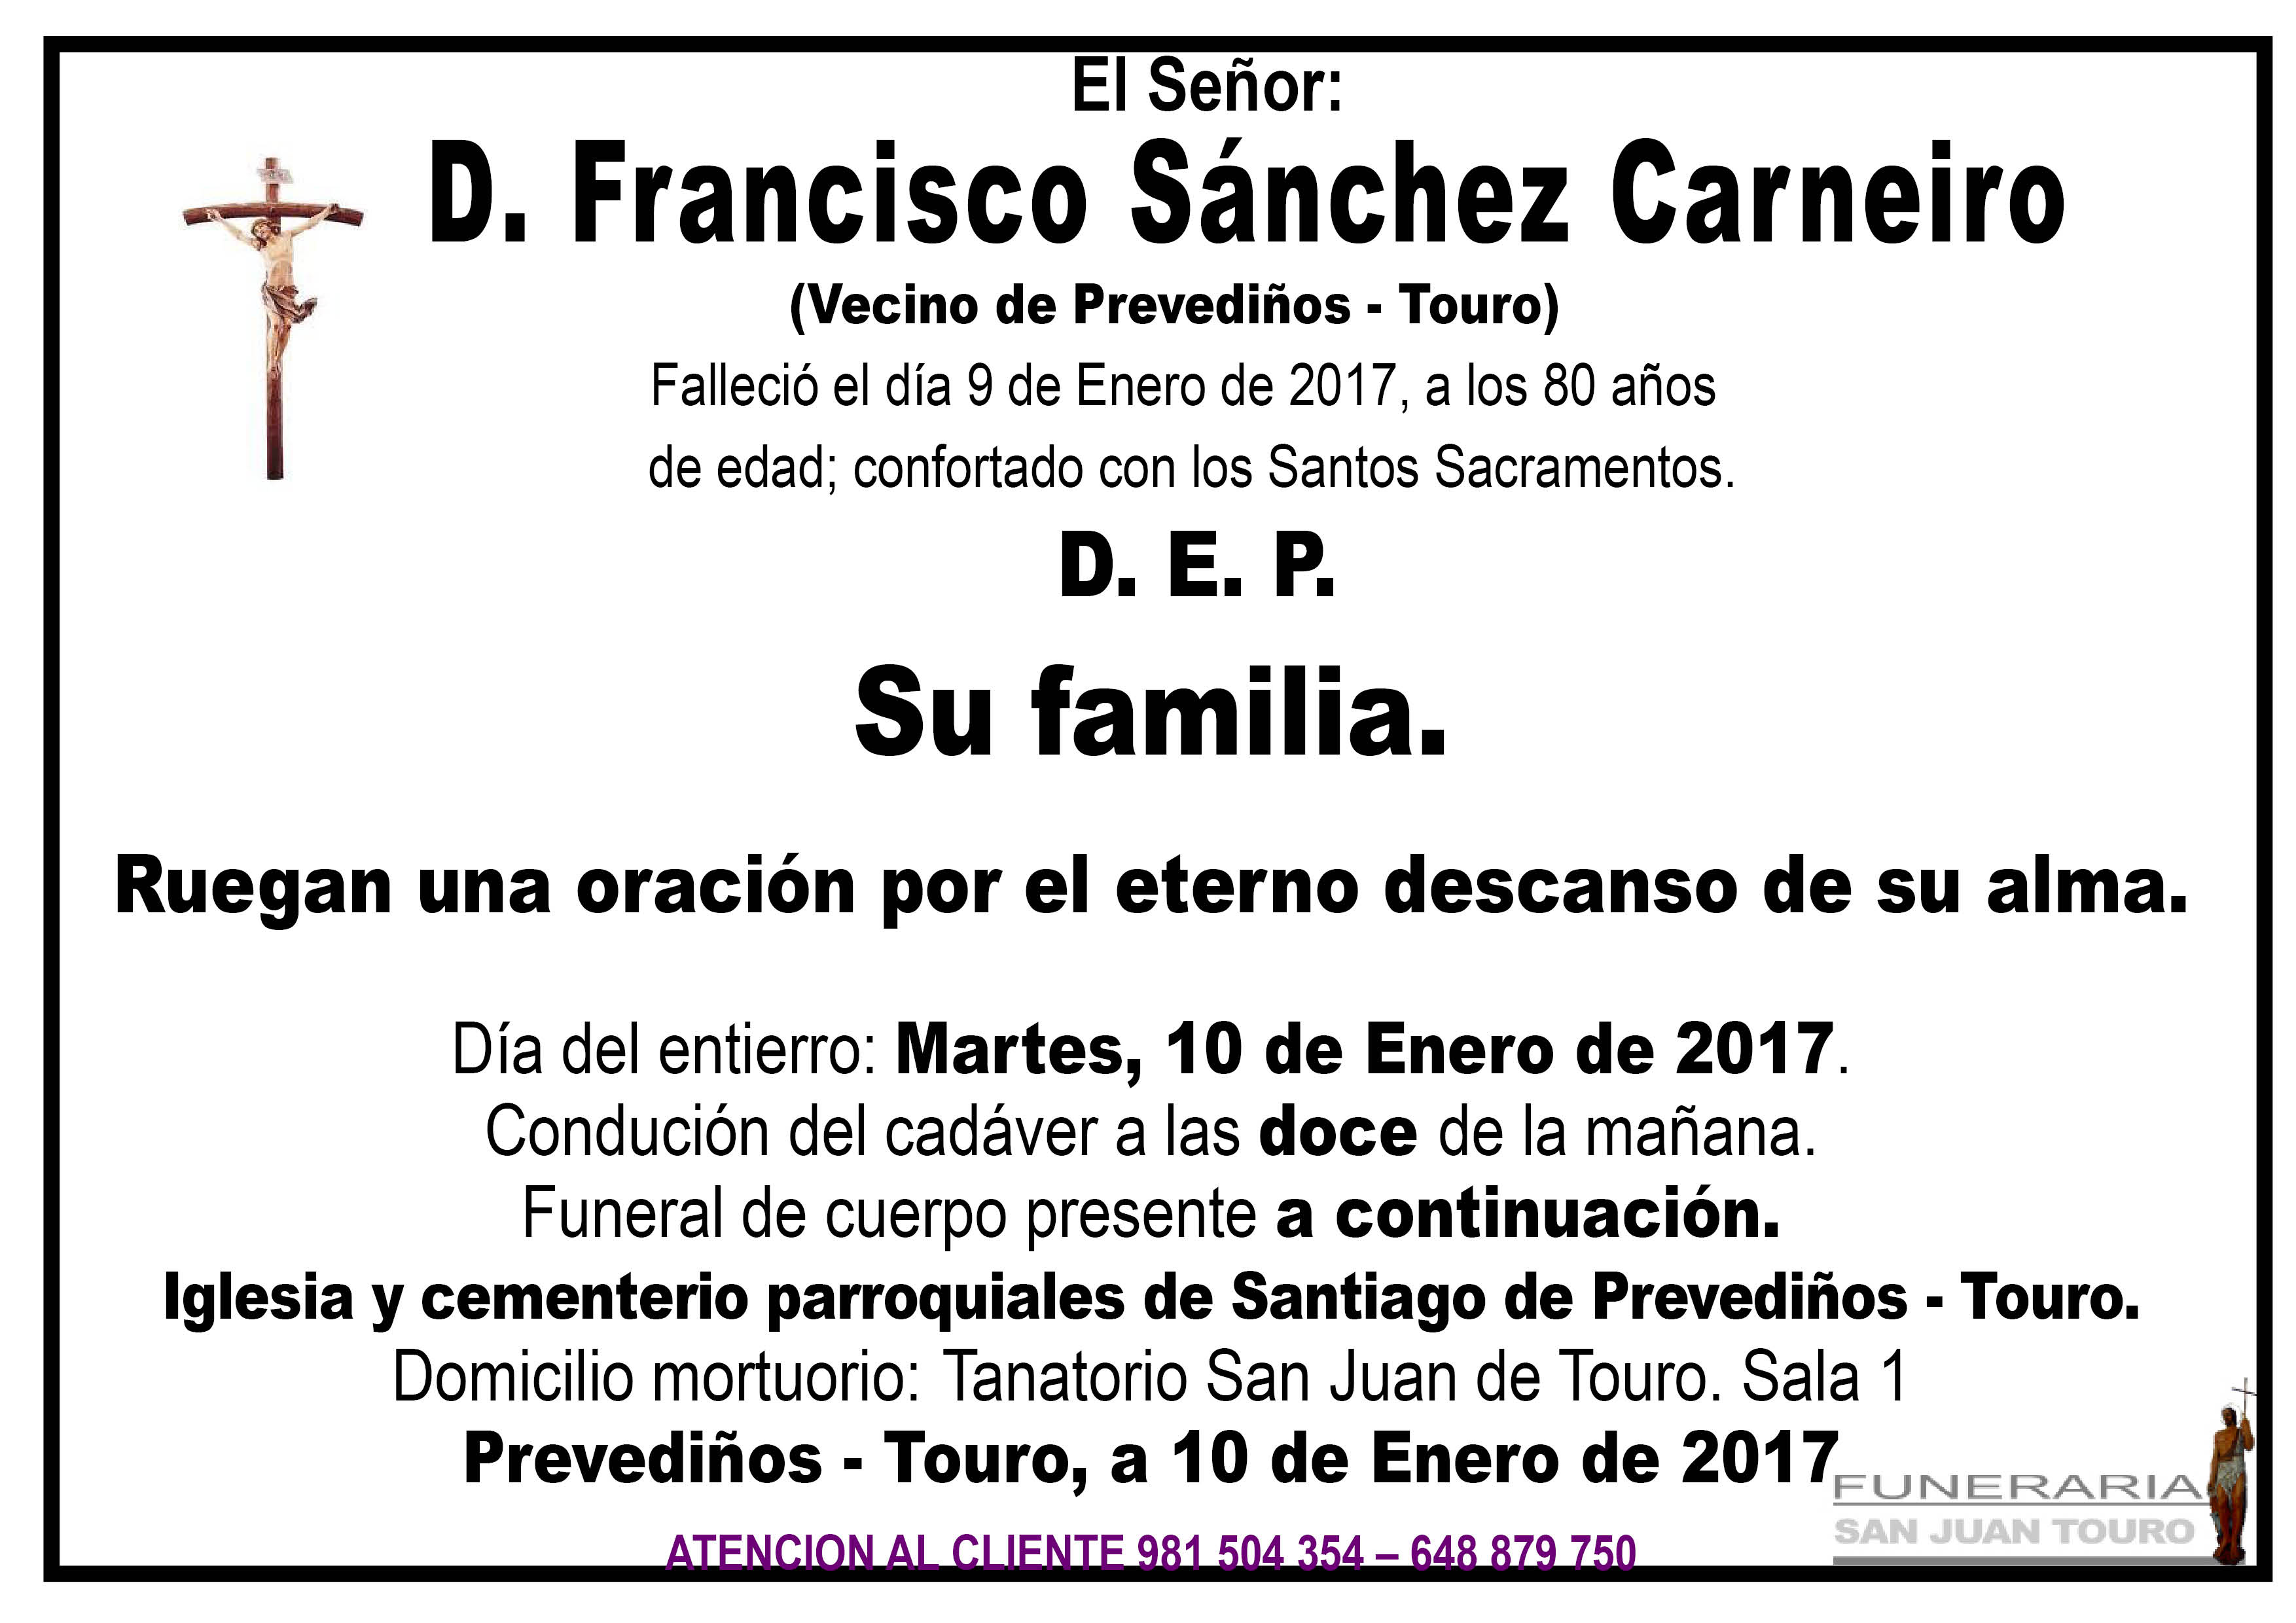 Esquela de SEPELIO DE D FRANCISCO SÁNCHEZ CARNEIRO